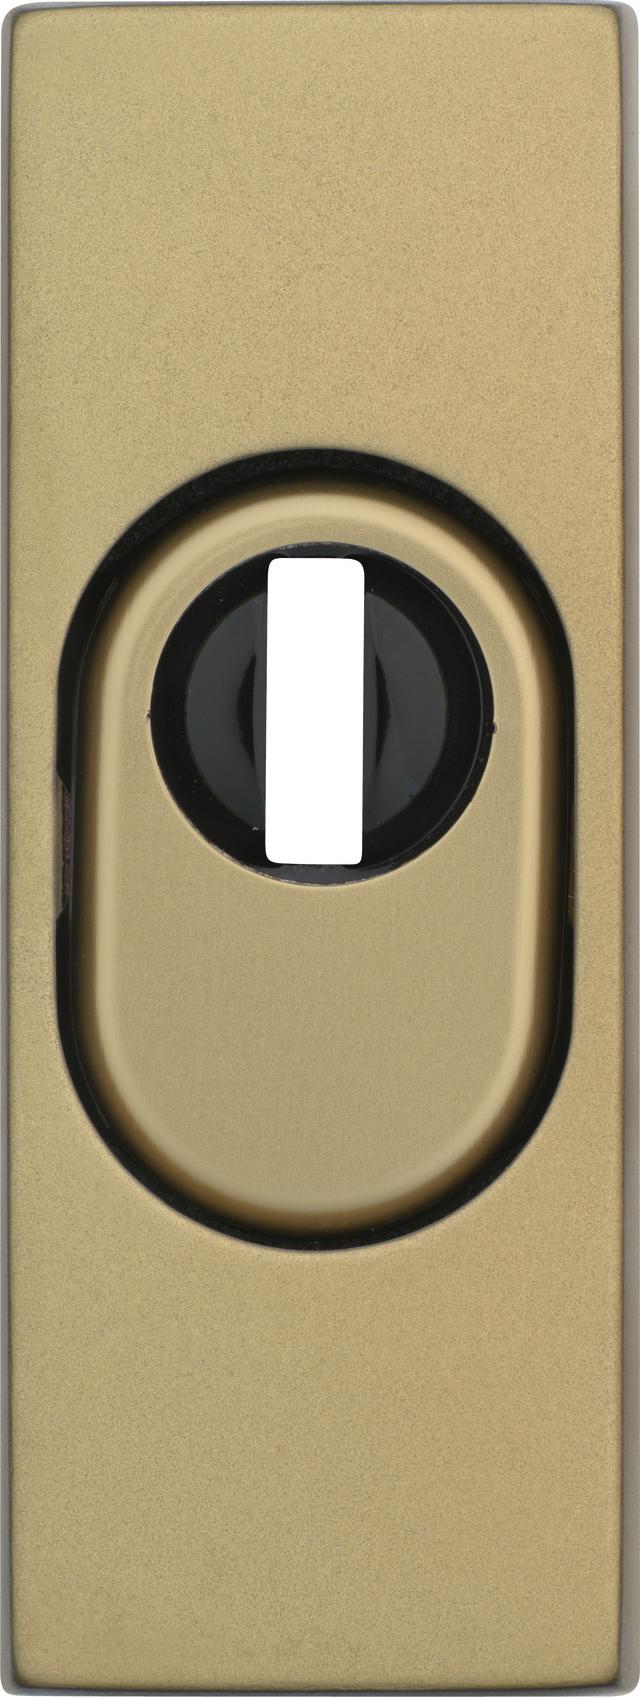 Schutzrosette RSZS316 F4 EK